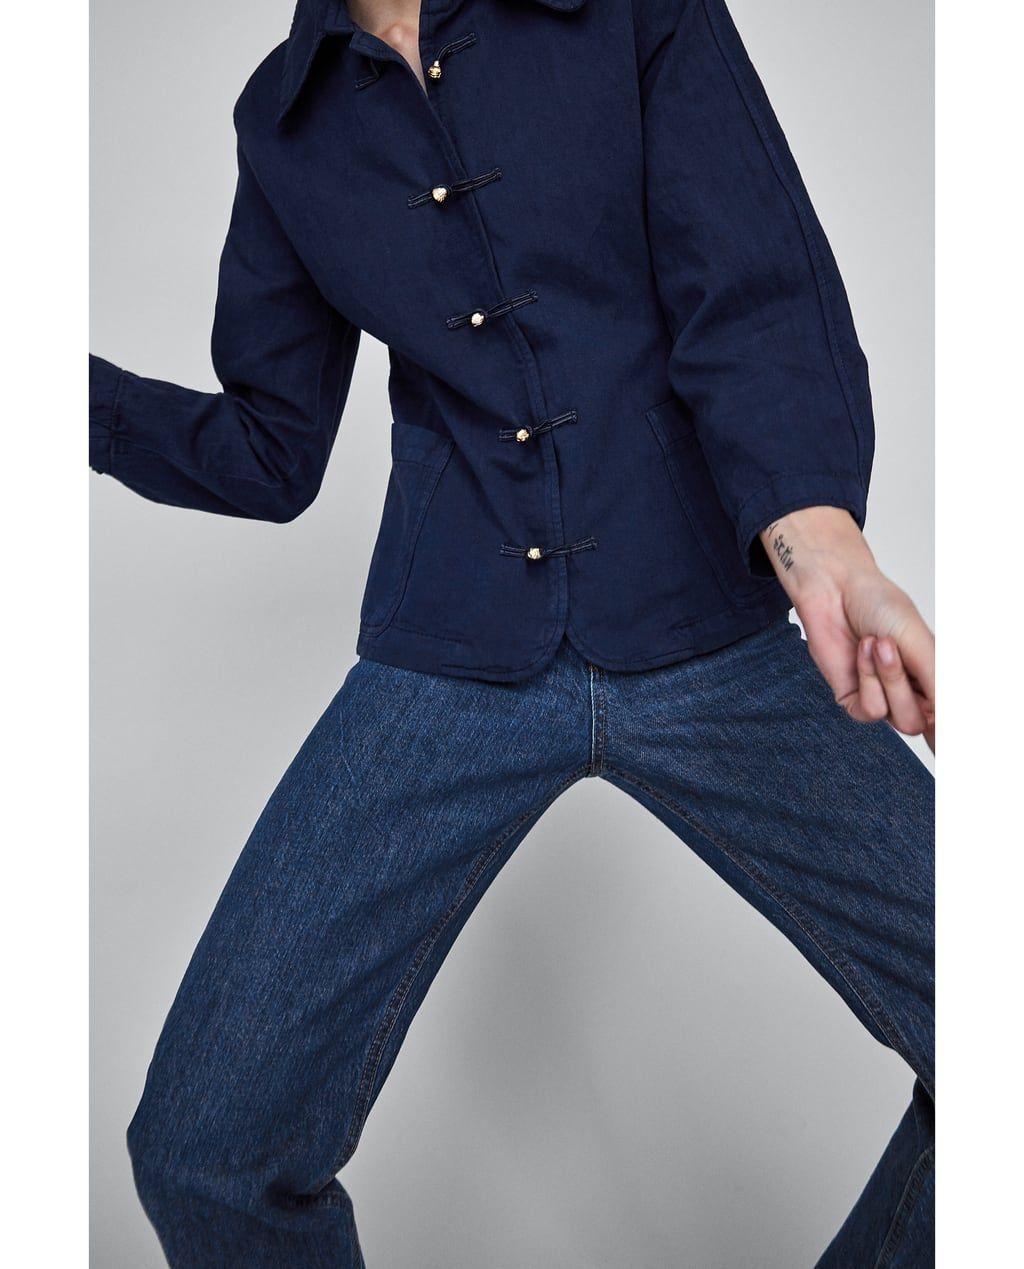 ffd00b03ca Jeans zw premium floppy chino forest green | buenas ideas | Jackets ...